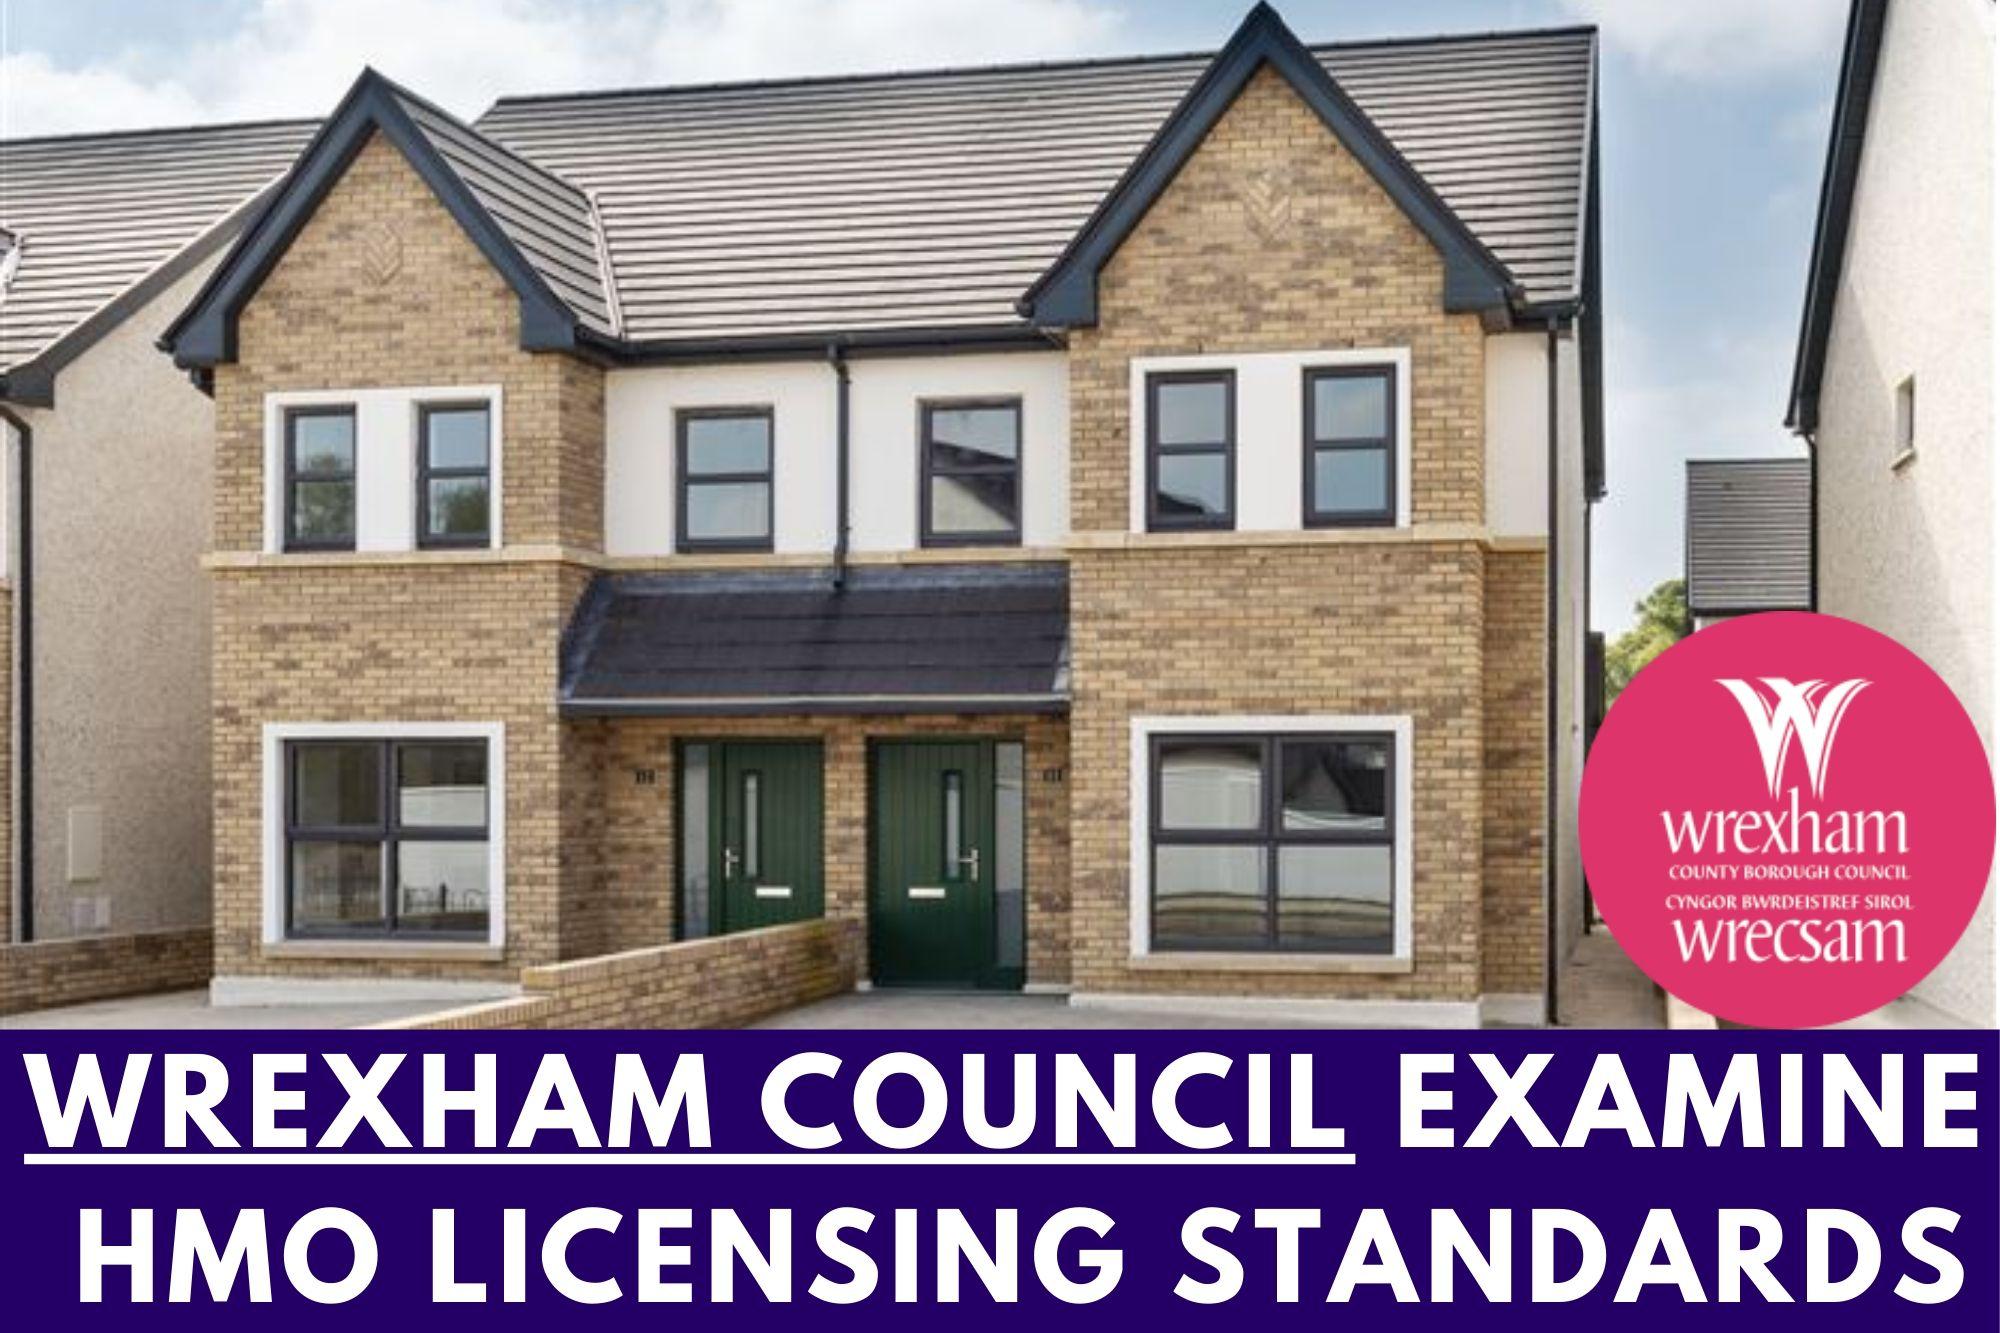 Wrexham Council examine HMO Licensing Standards